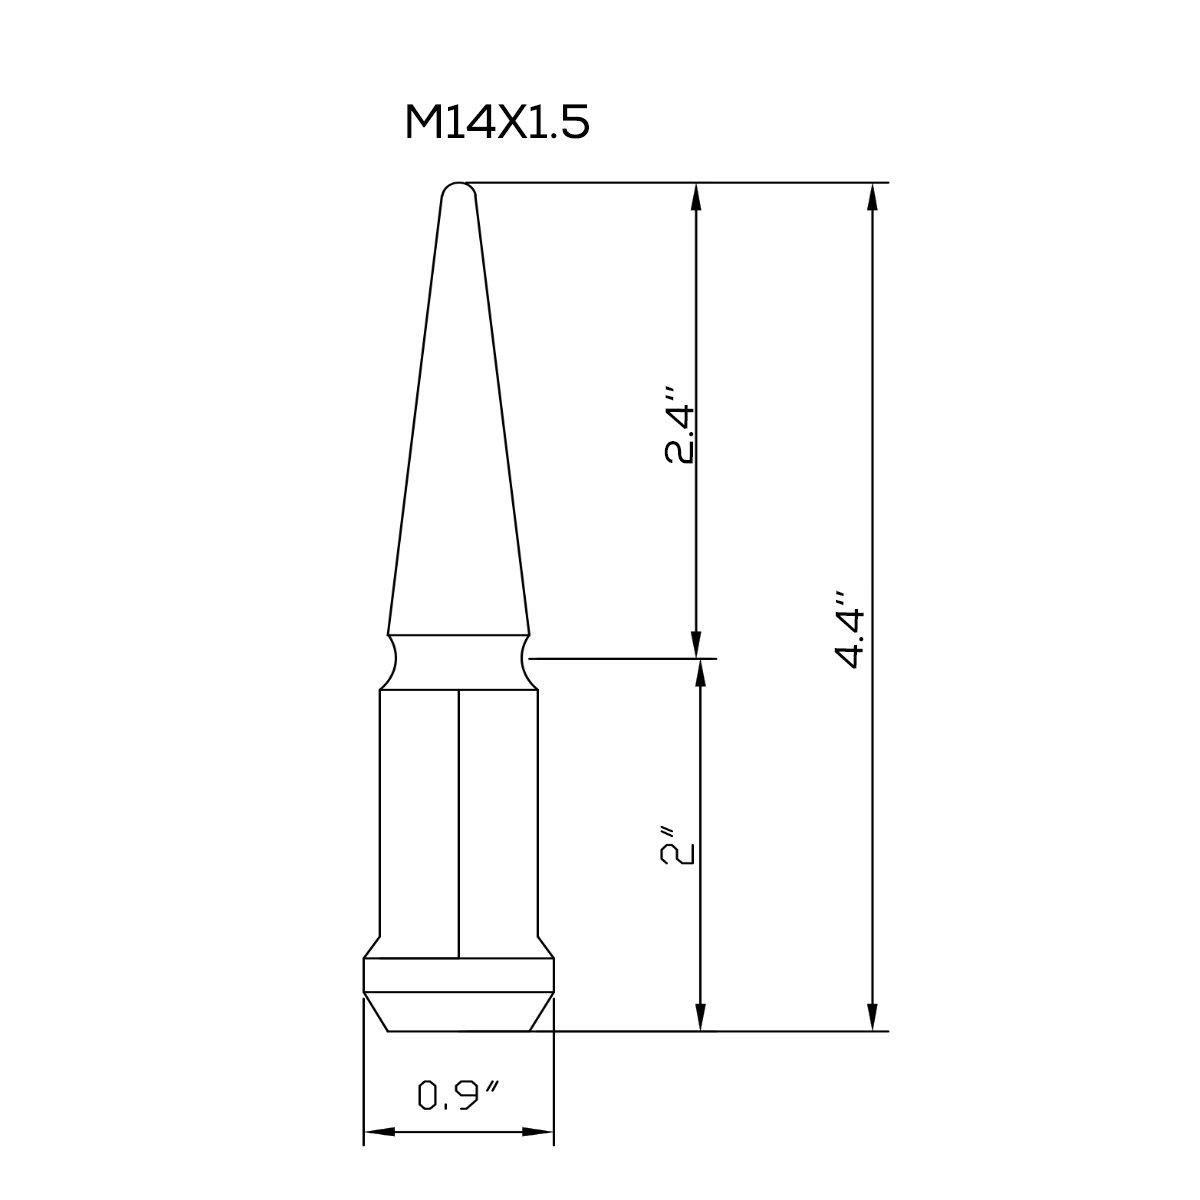 KSP 32 PCS Black Spike Lug Nuts 14x1.5 Spiked Metal Lug Nuts Solid 4.4 Tall Acorn Lug Nut with 1 Special Design Key for Aftermarket Wheels Goldenlion